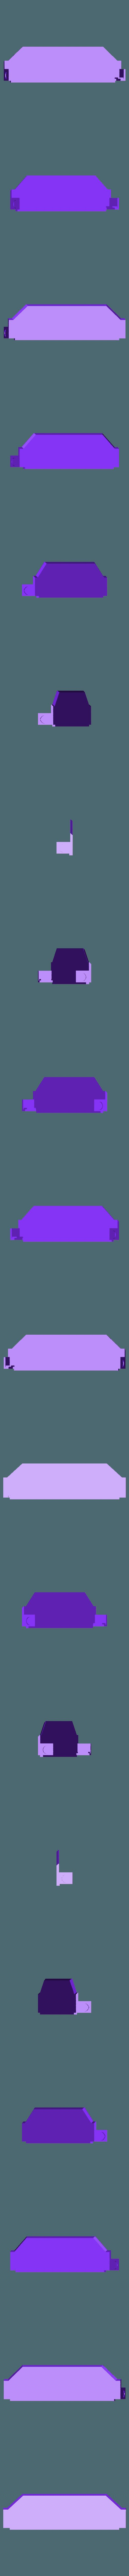 LogoCassette2.stl Download free STL file Cassette Tape Case with Customizable Logos / Album Art • 3D printable model, tonyyoungblood